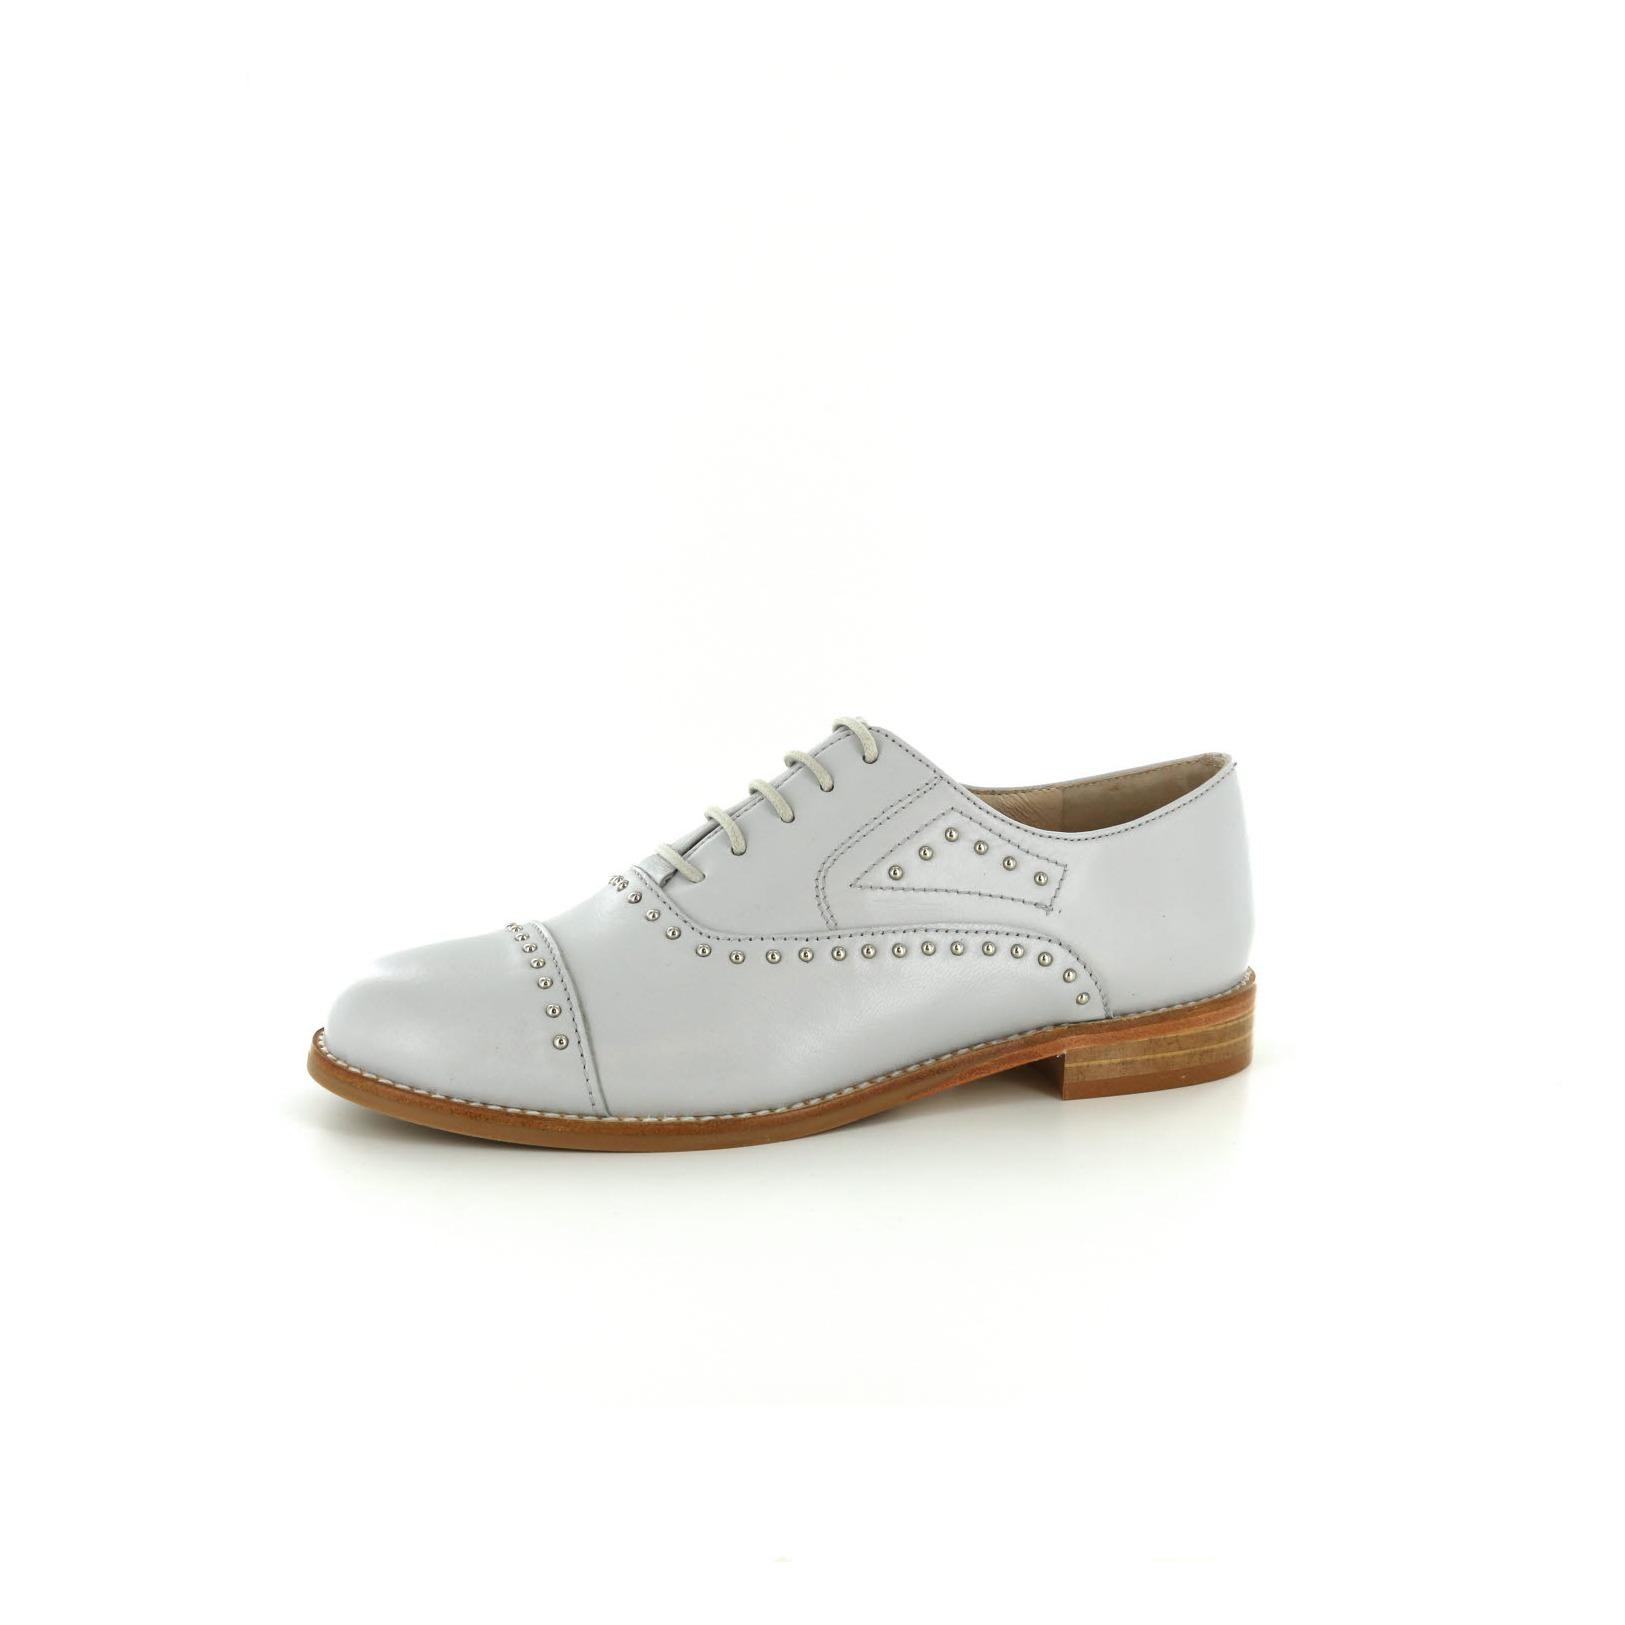 Chaussures Gadea / Dentelle - Chaussures De Sport, Gris